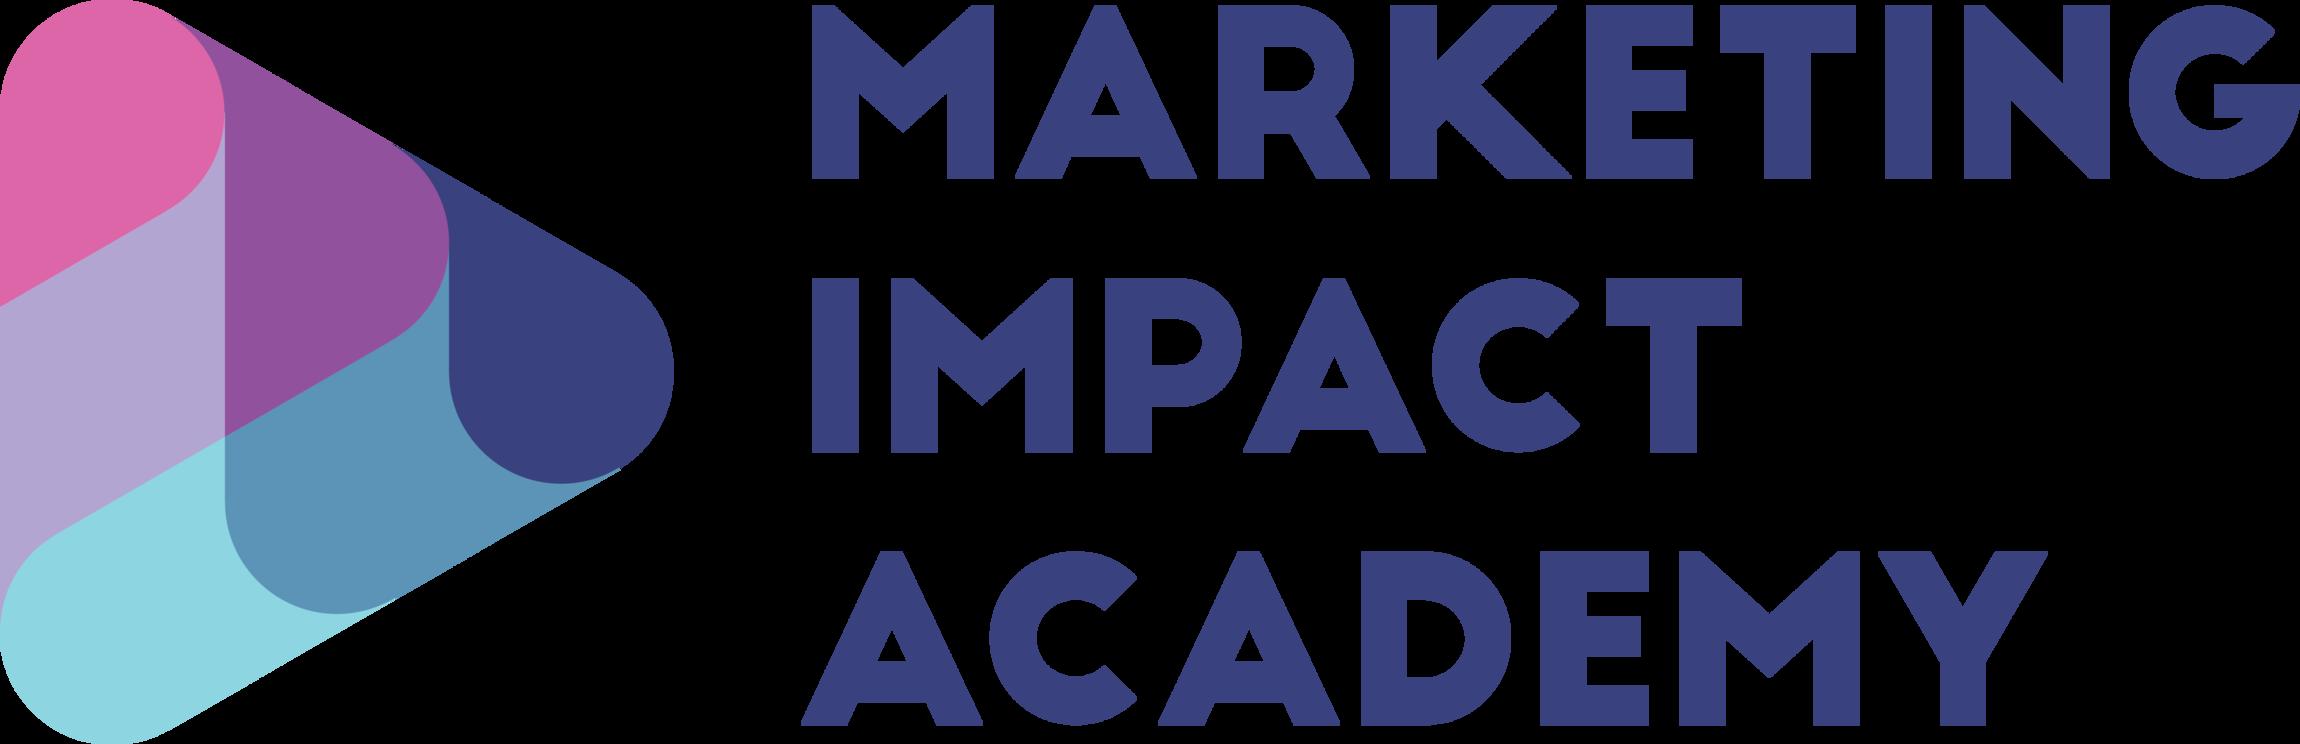 Marketing Impact Academy Free Instagram Report by Chalene